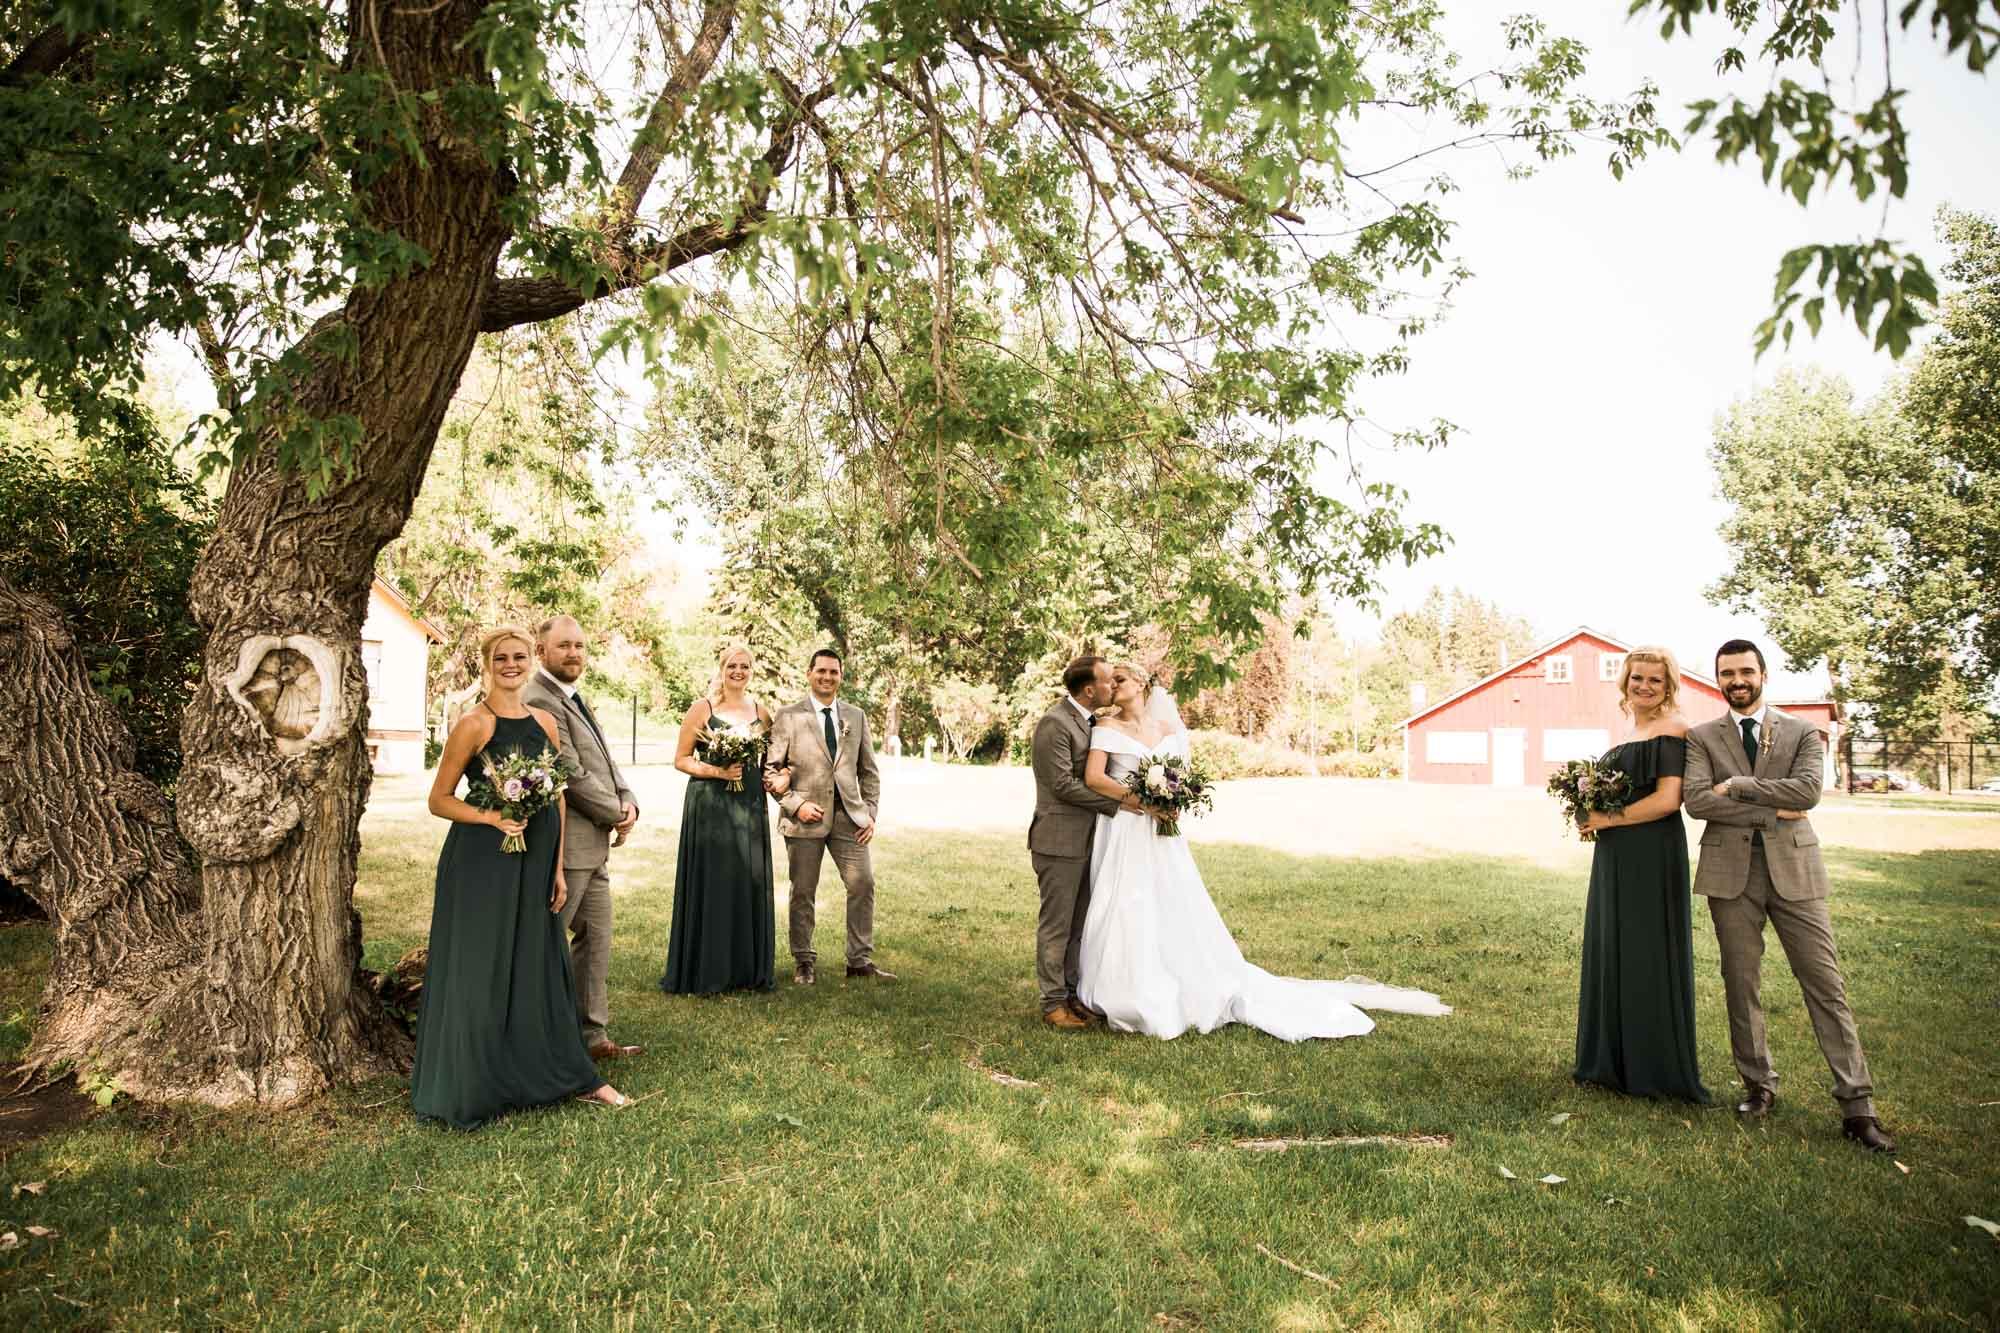 Calgary wedding photographer, the bridal party at Fish Creek Park in Calgary